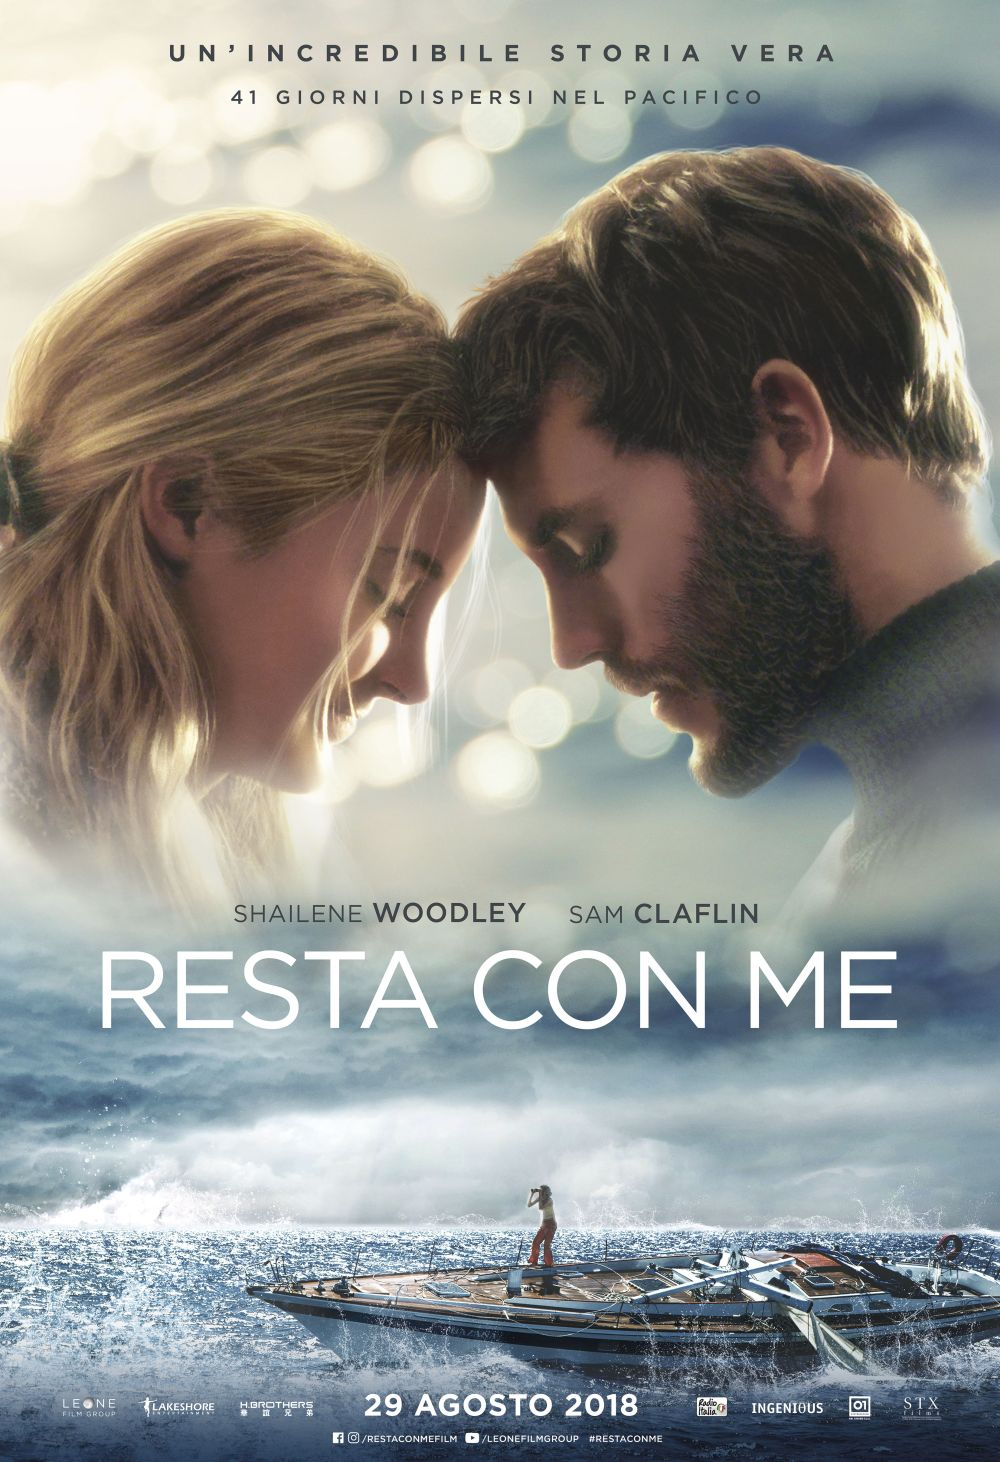 resta-con-me-main-poster_jpg_1400x0_q85